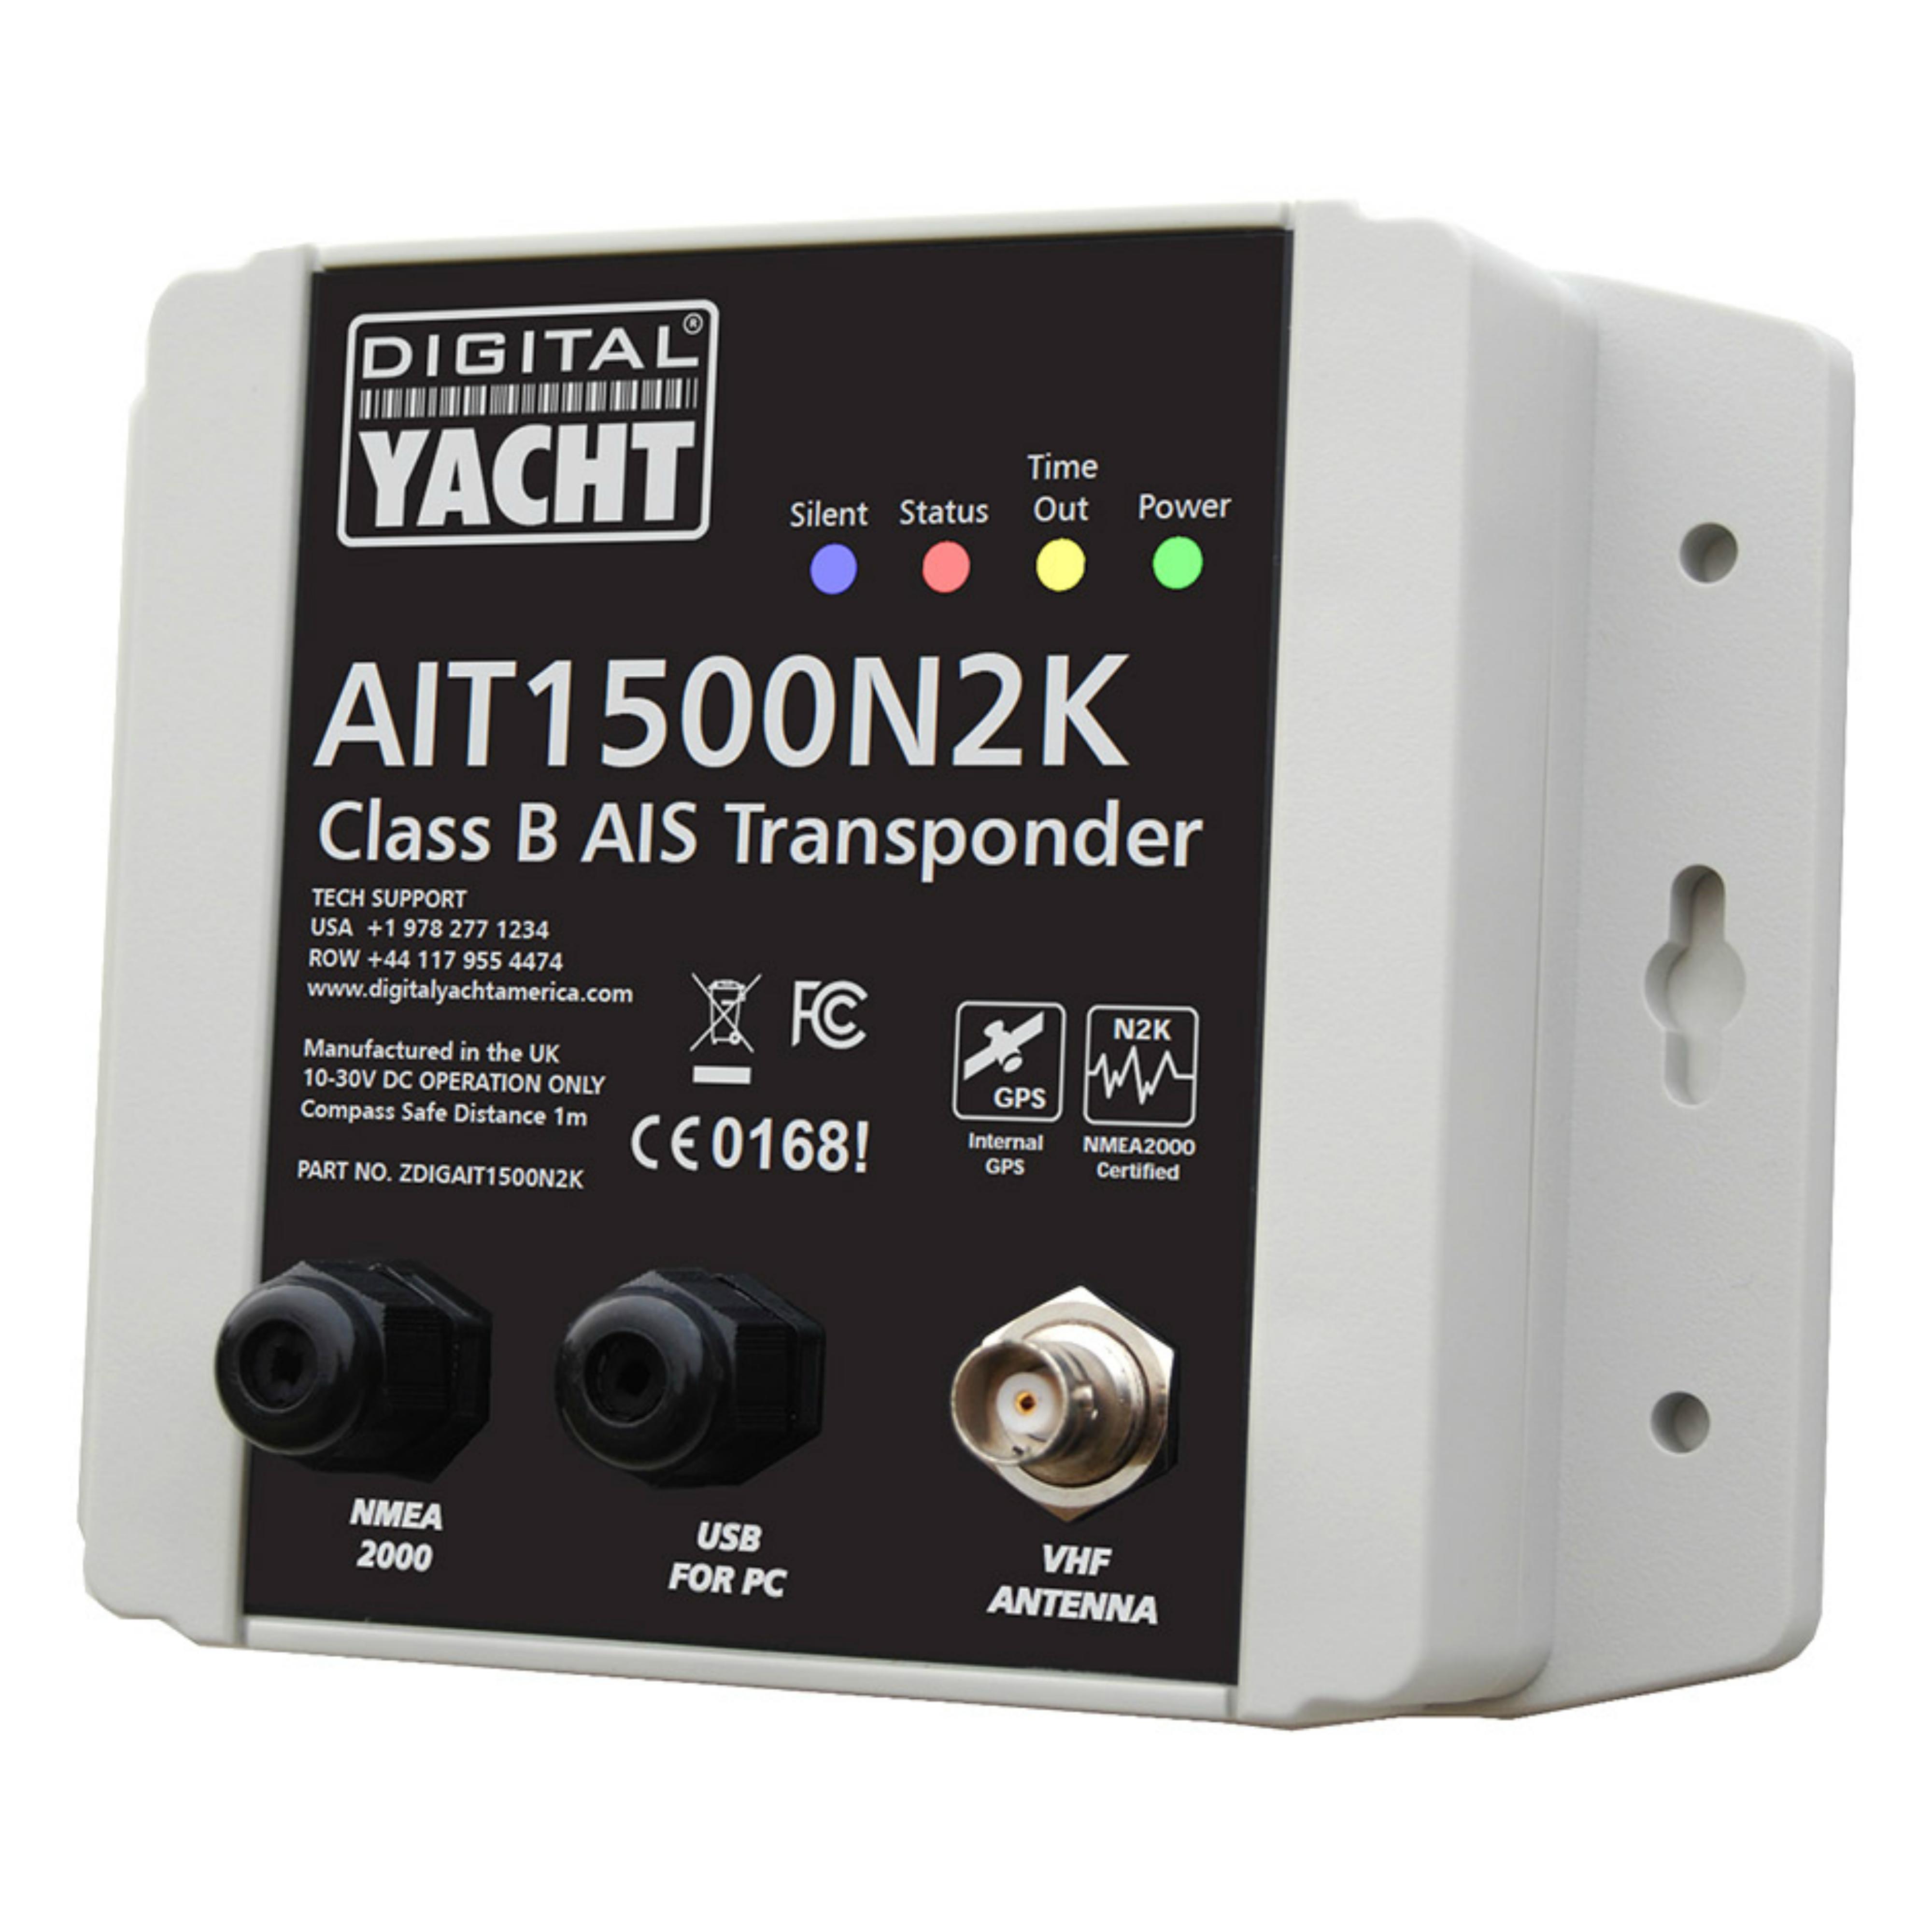 Digital Yacht-AIT1500N2K|Class B Transponder|Int GPS Antenna|Plug 'n Play NMEA 2000